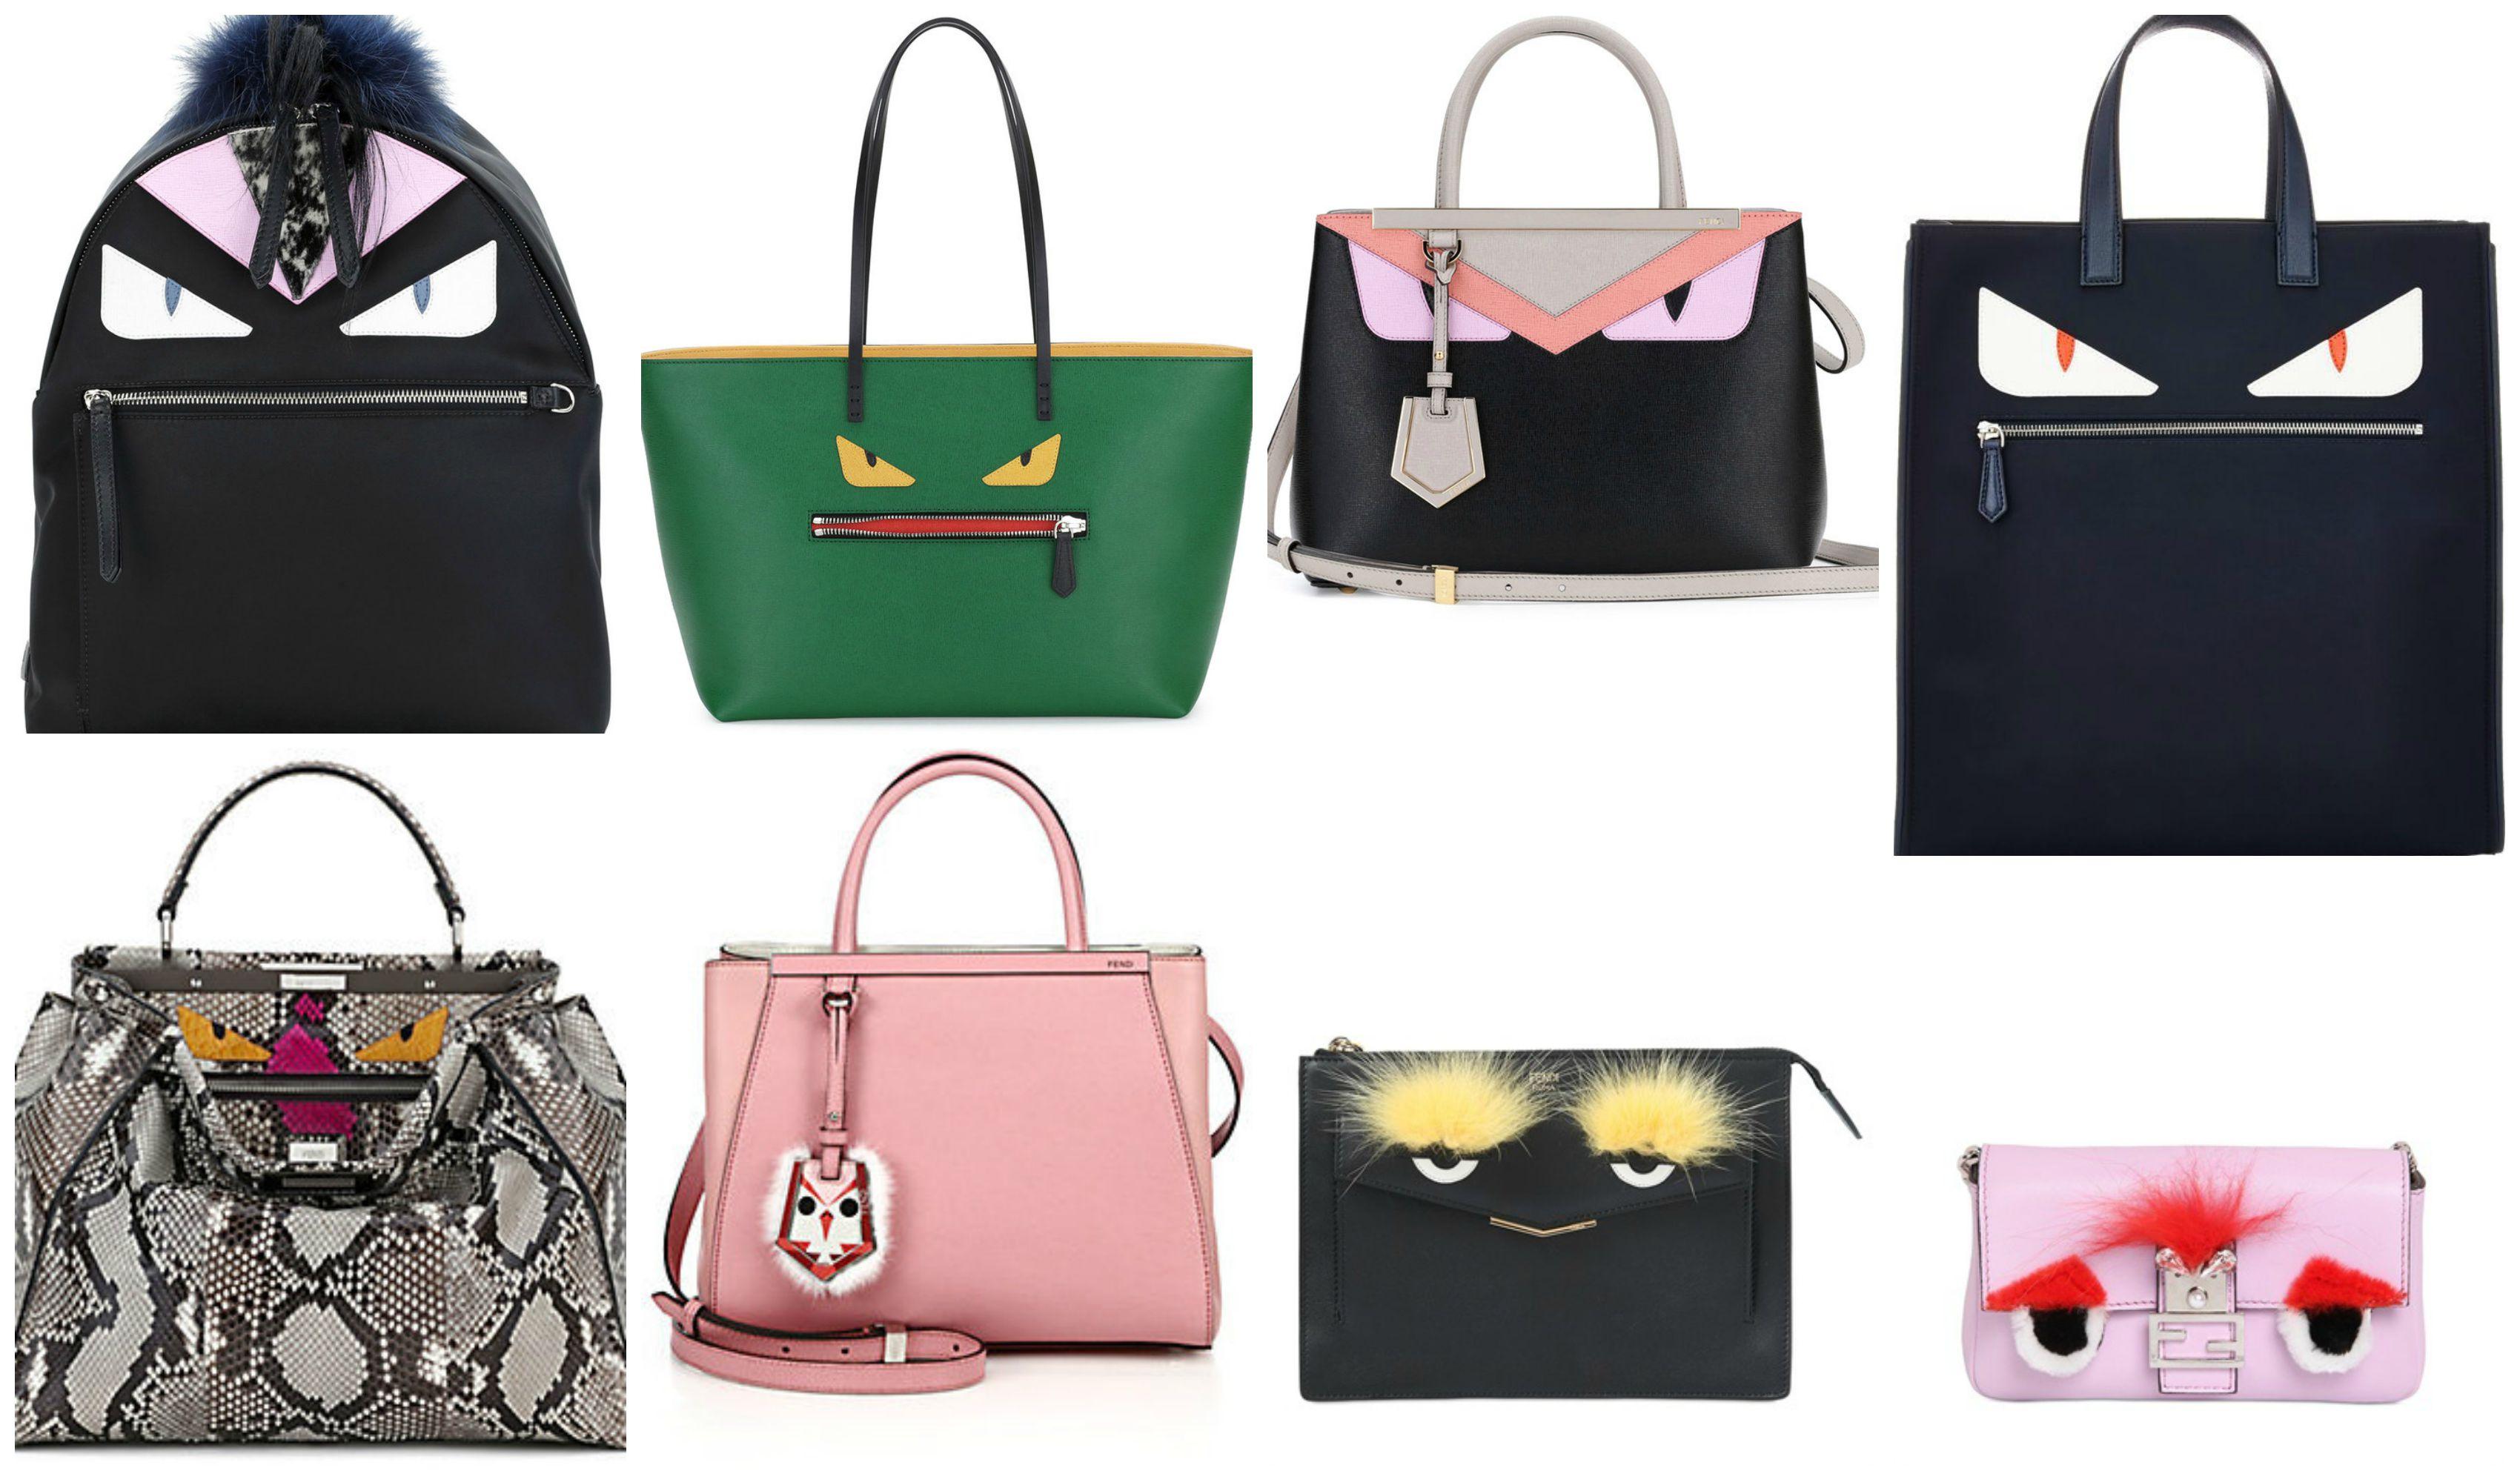 ... norway bags little bitty city one. fendi handbags shopstyle 65312 c2581 a8634d74f848c